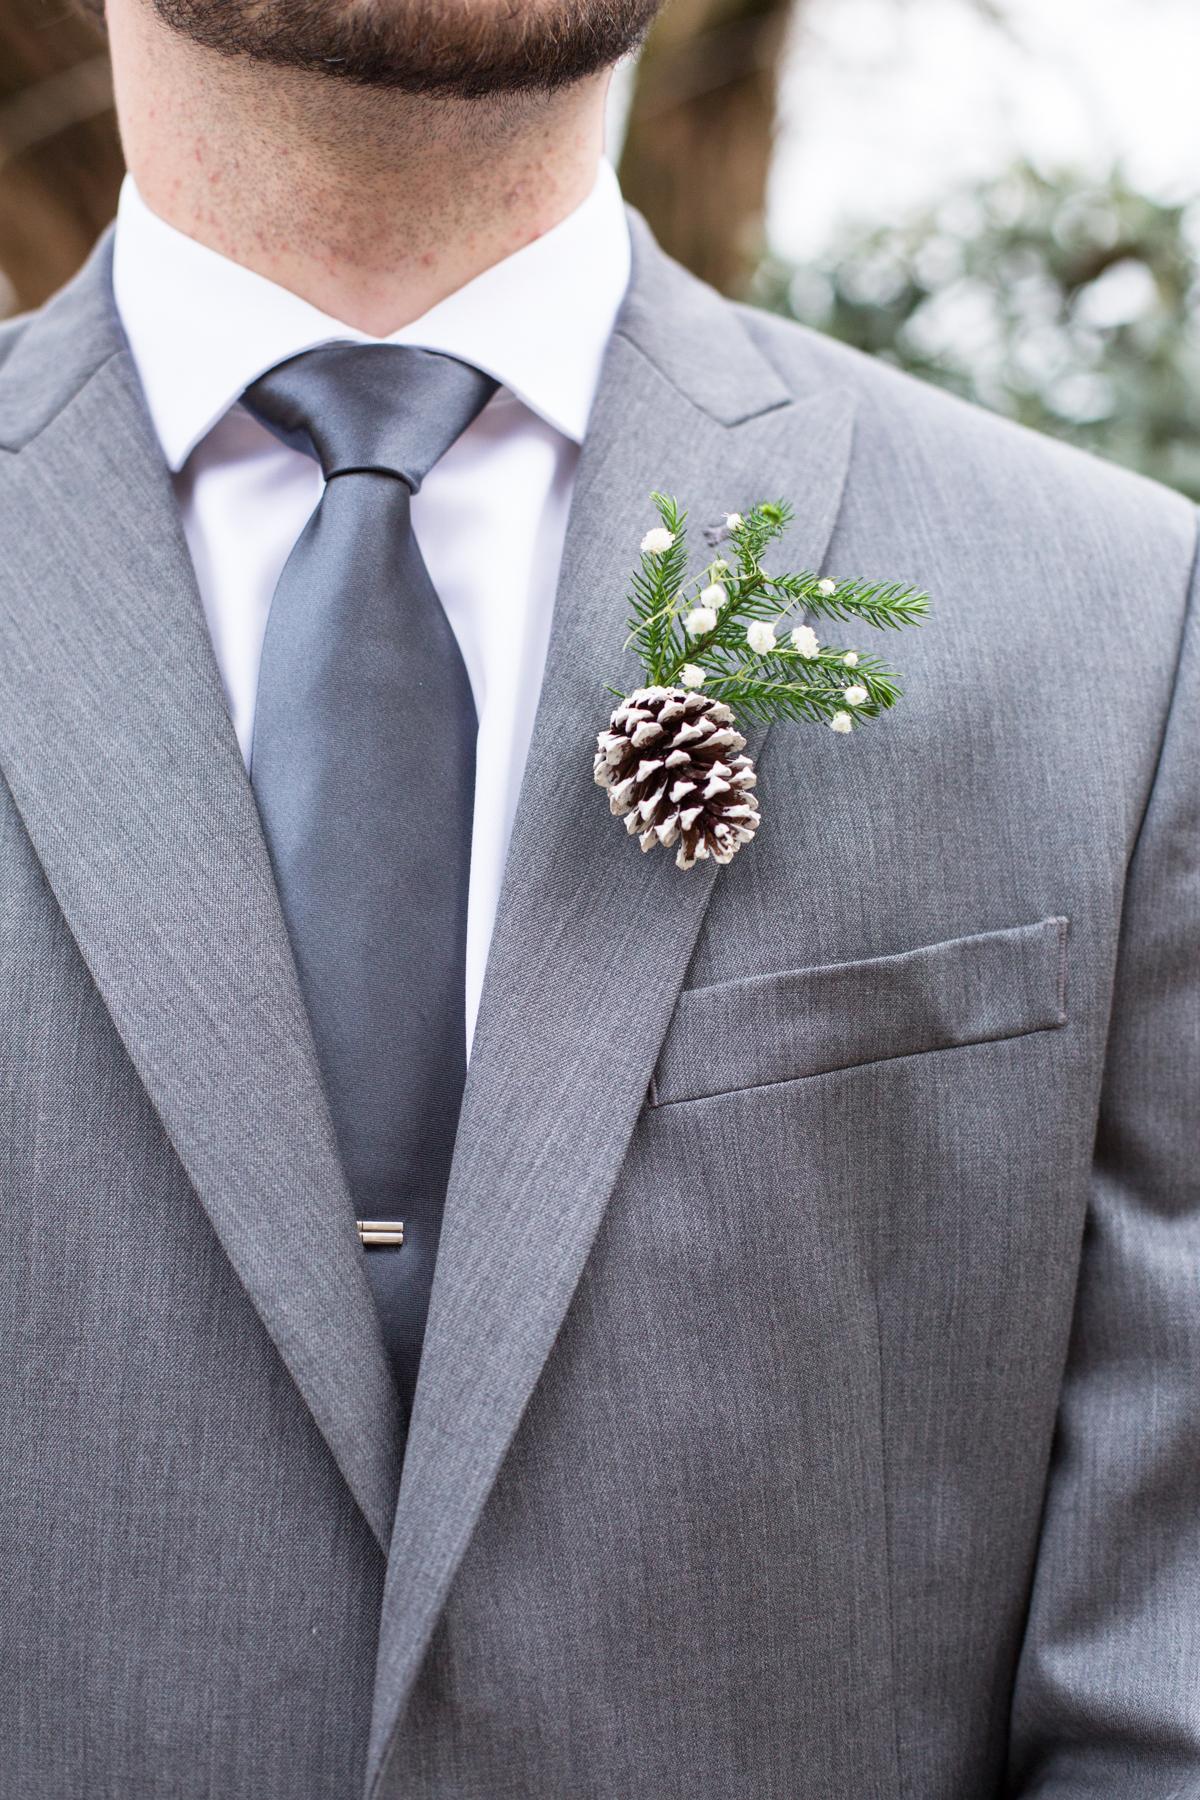 Kelli-and-Matt-Nashville-Wedding-Sneak-Peak-0187.jpg